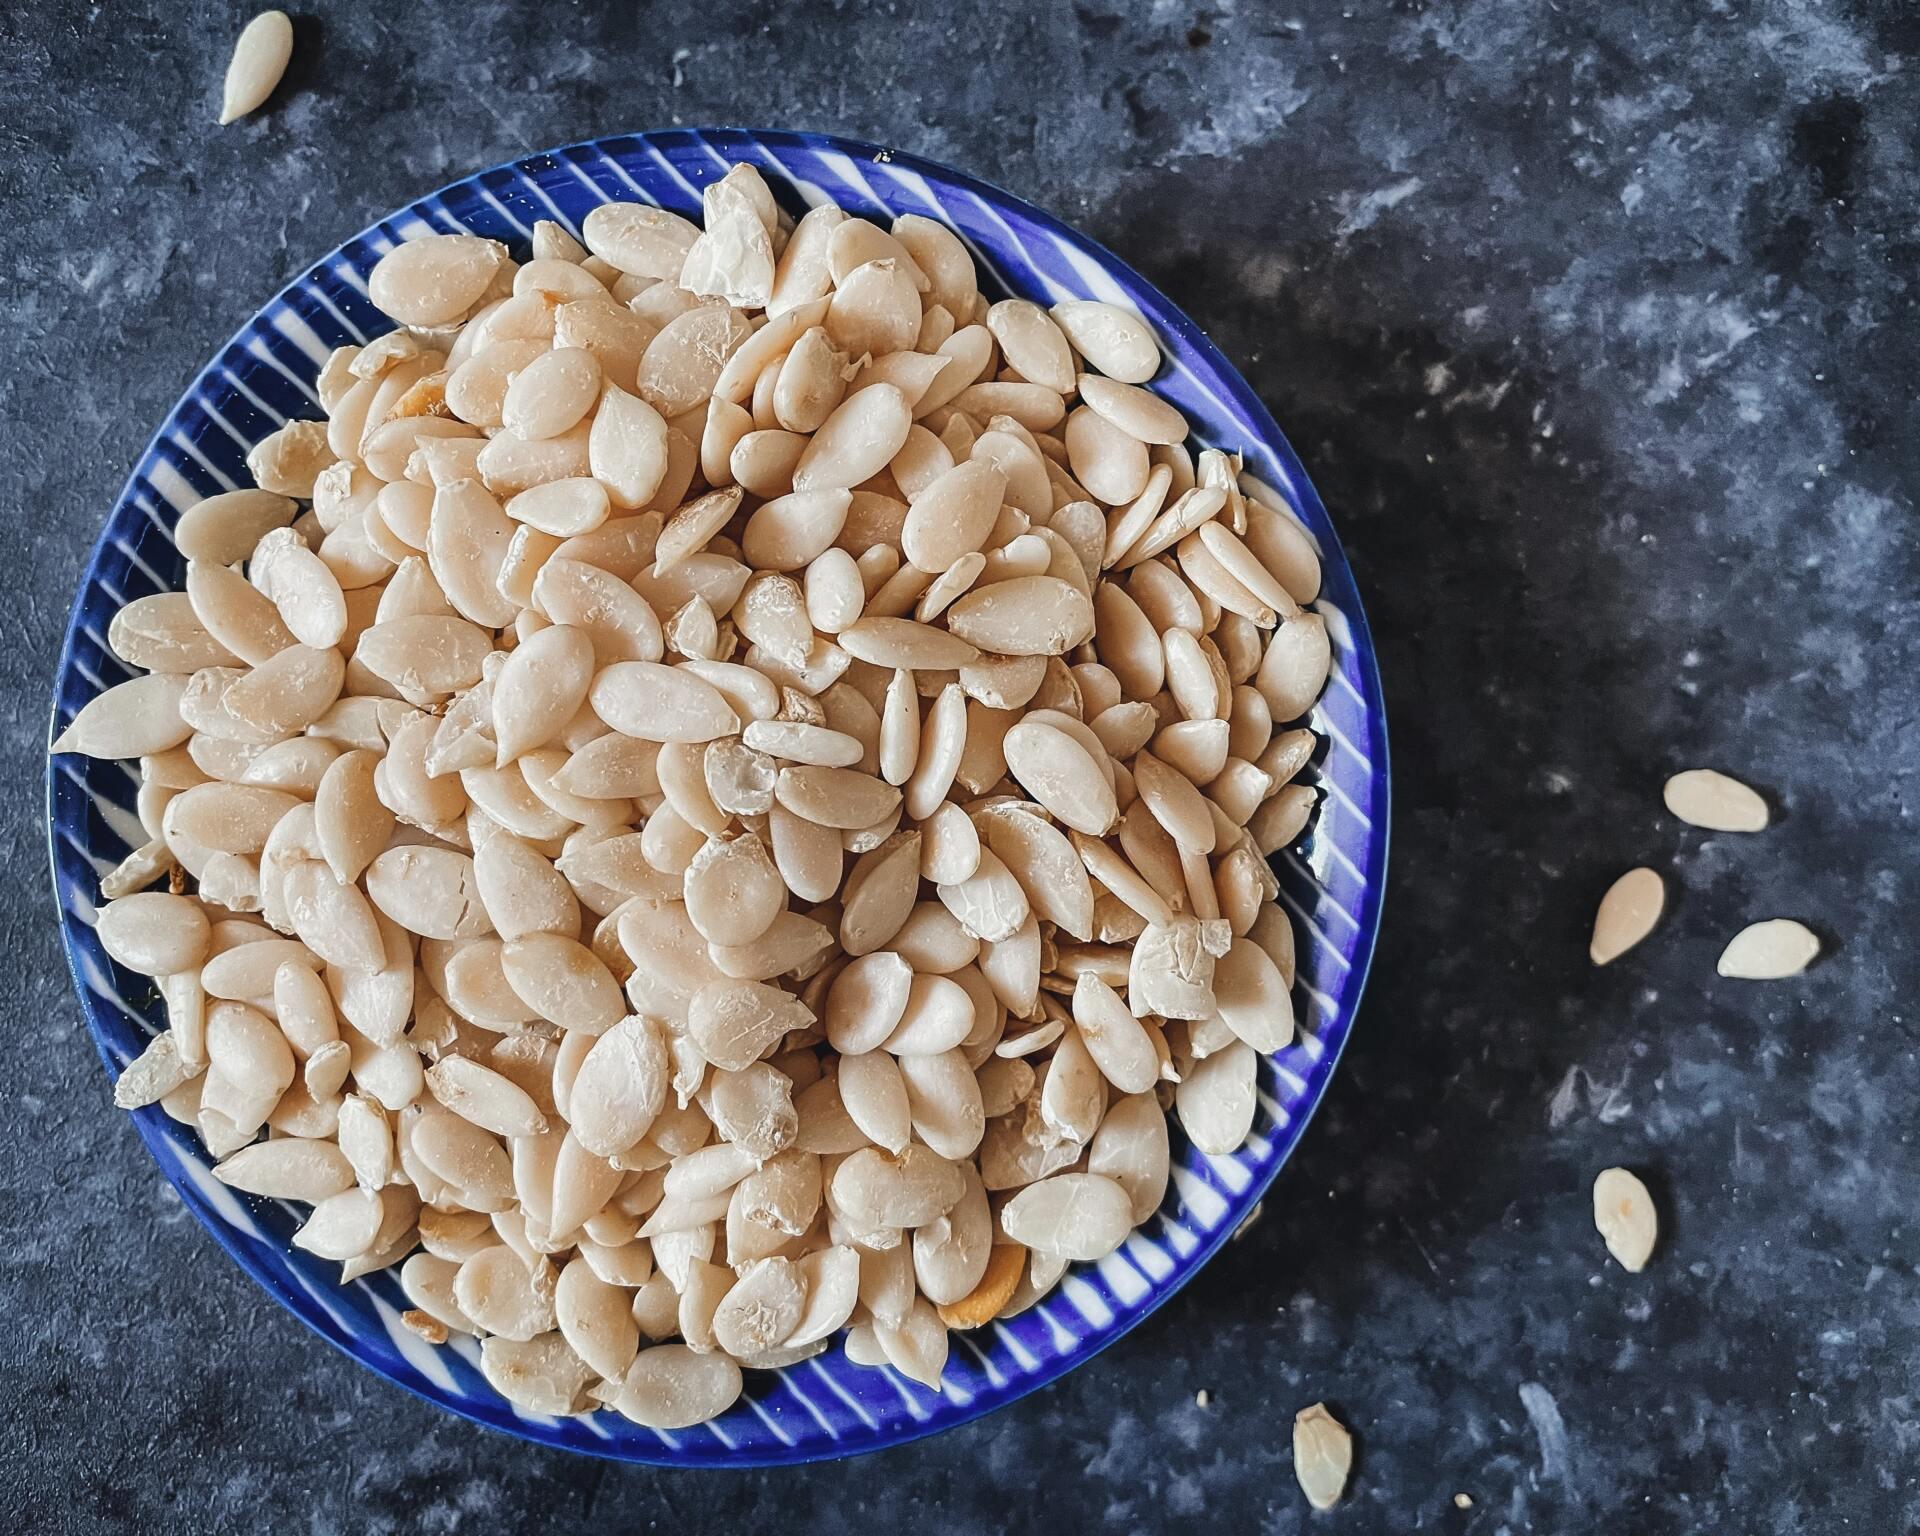 Egusi (melon) seeds health and nutrition benefits | Somi Igbene